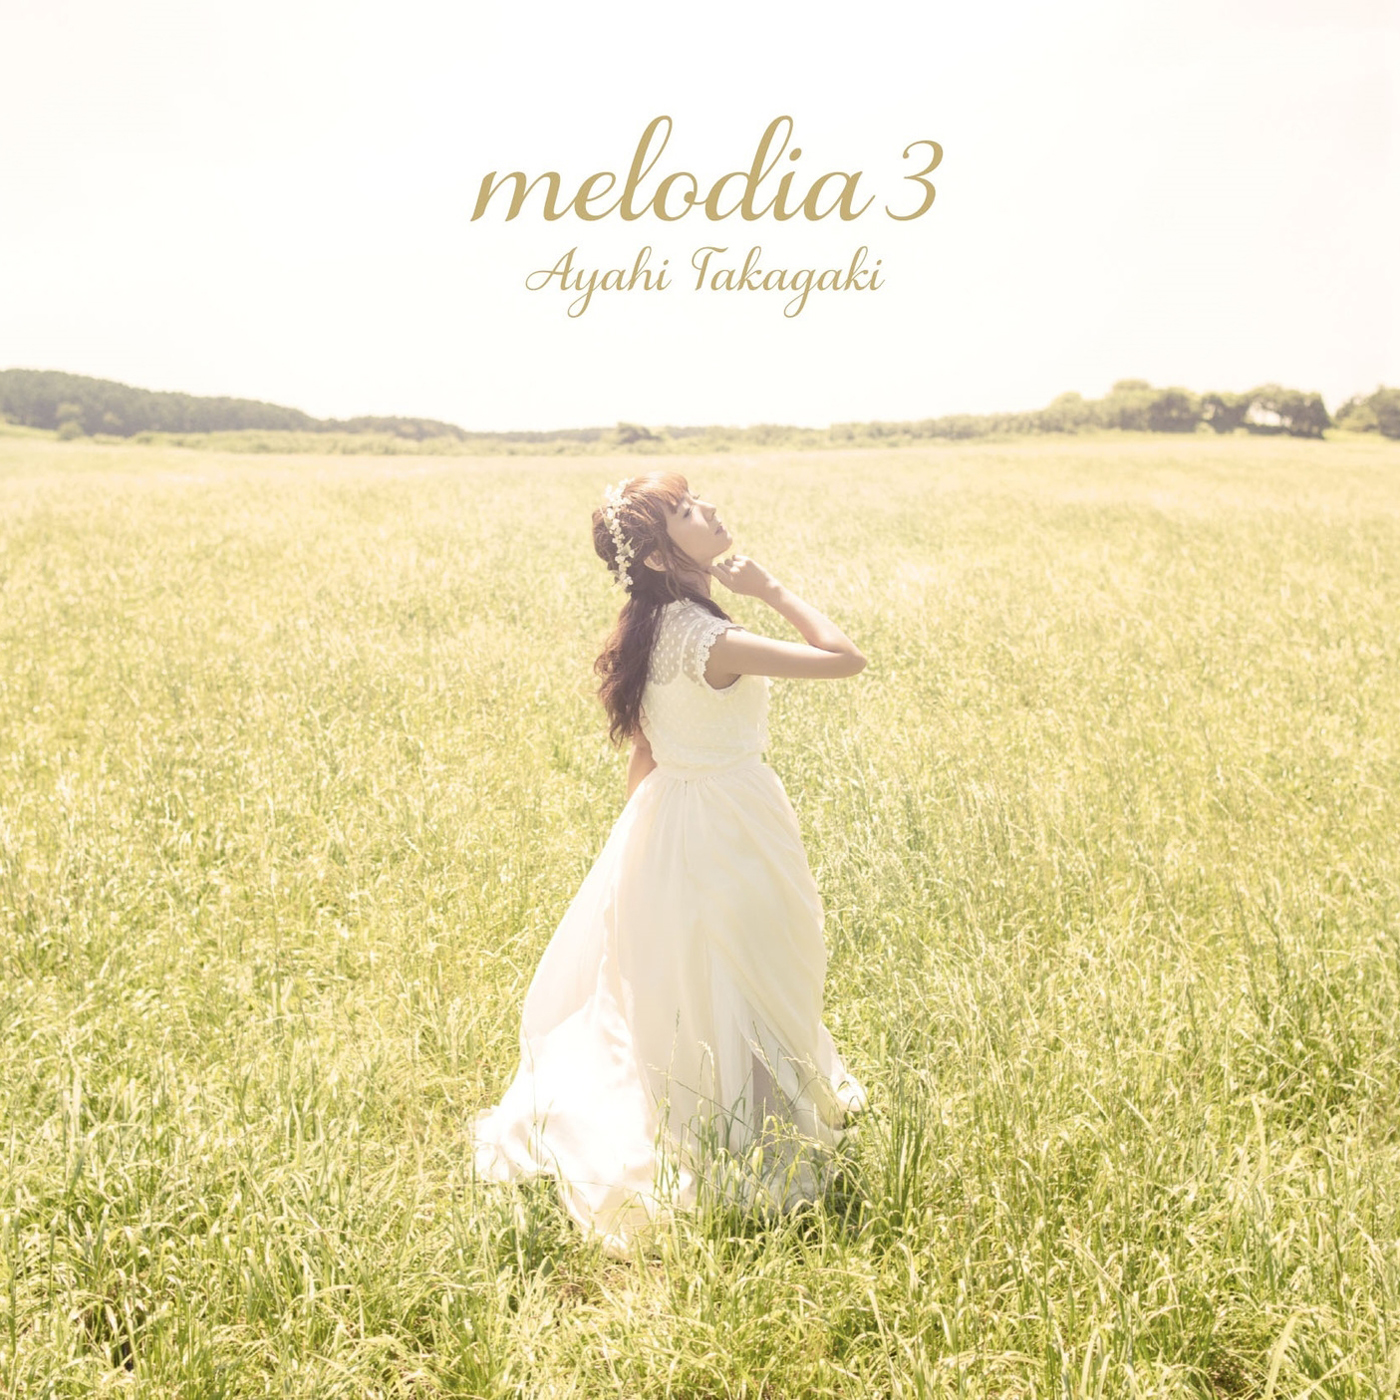 20180328.1700.01 Ayahi Takagaki - melodia 3 (FLAC) cover.jpg